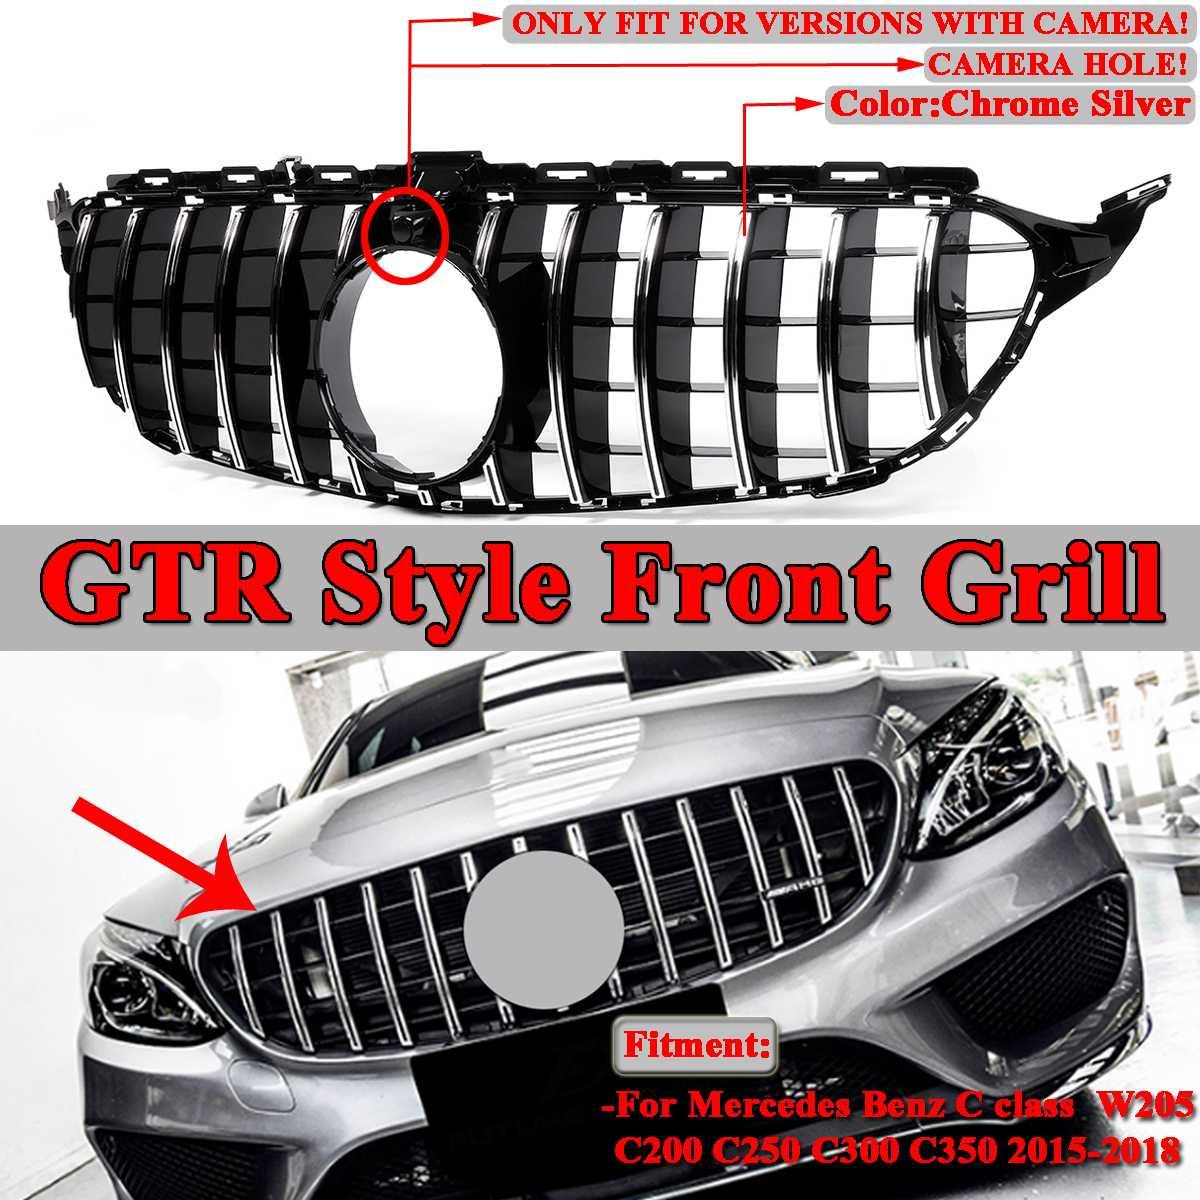 W205 gtr gt r 스타일 자동차 프론트 그릴 그릴 블랙/크롬 실버 메르세데스 벤츠 w205 c200 c250 c300 c350 2015-2018 2dr/4dr